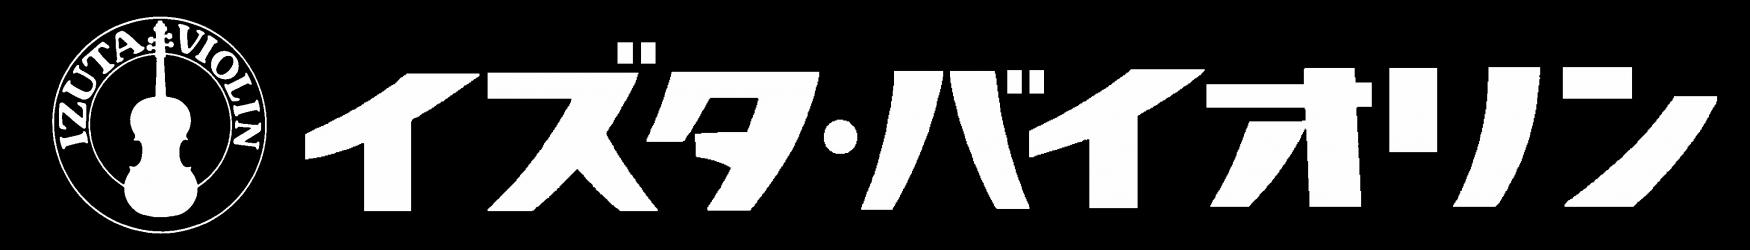 Izuta-Violin